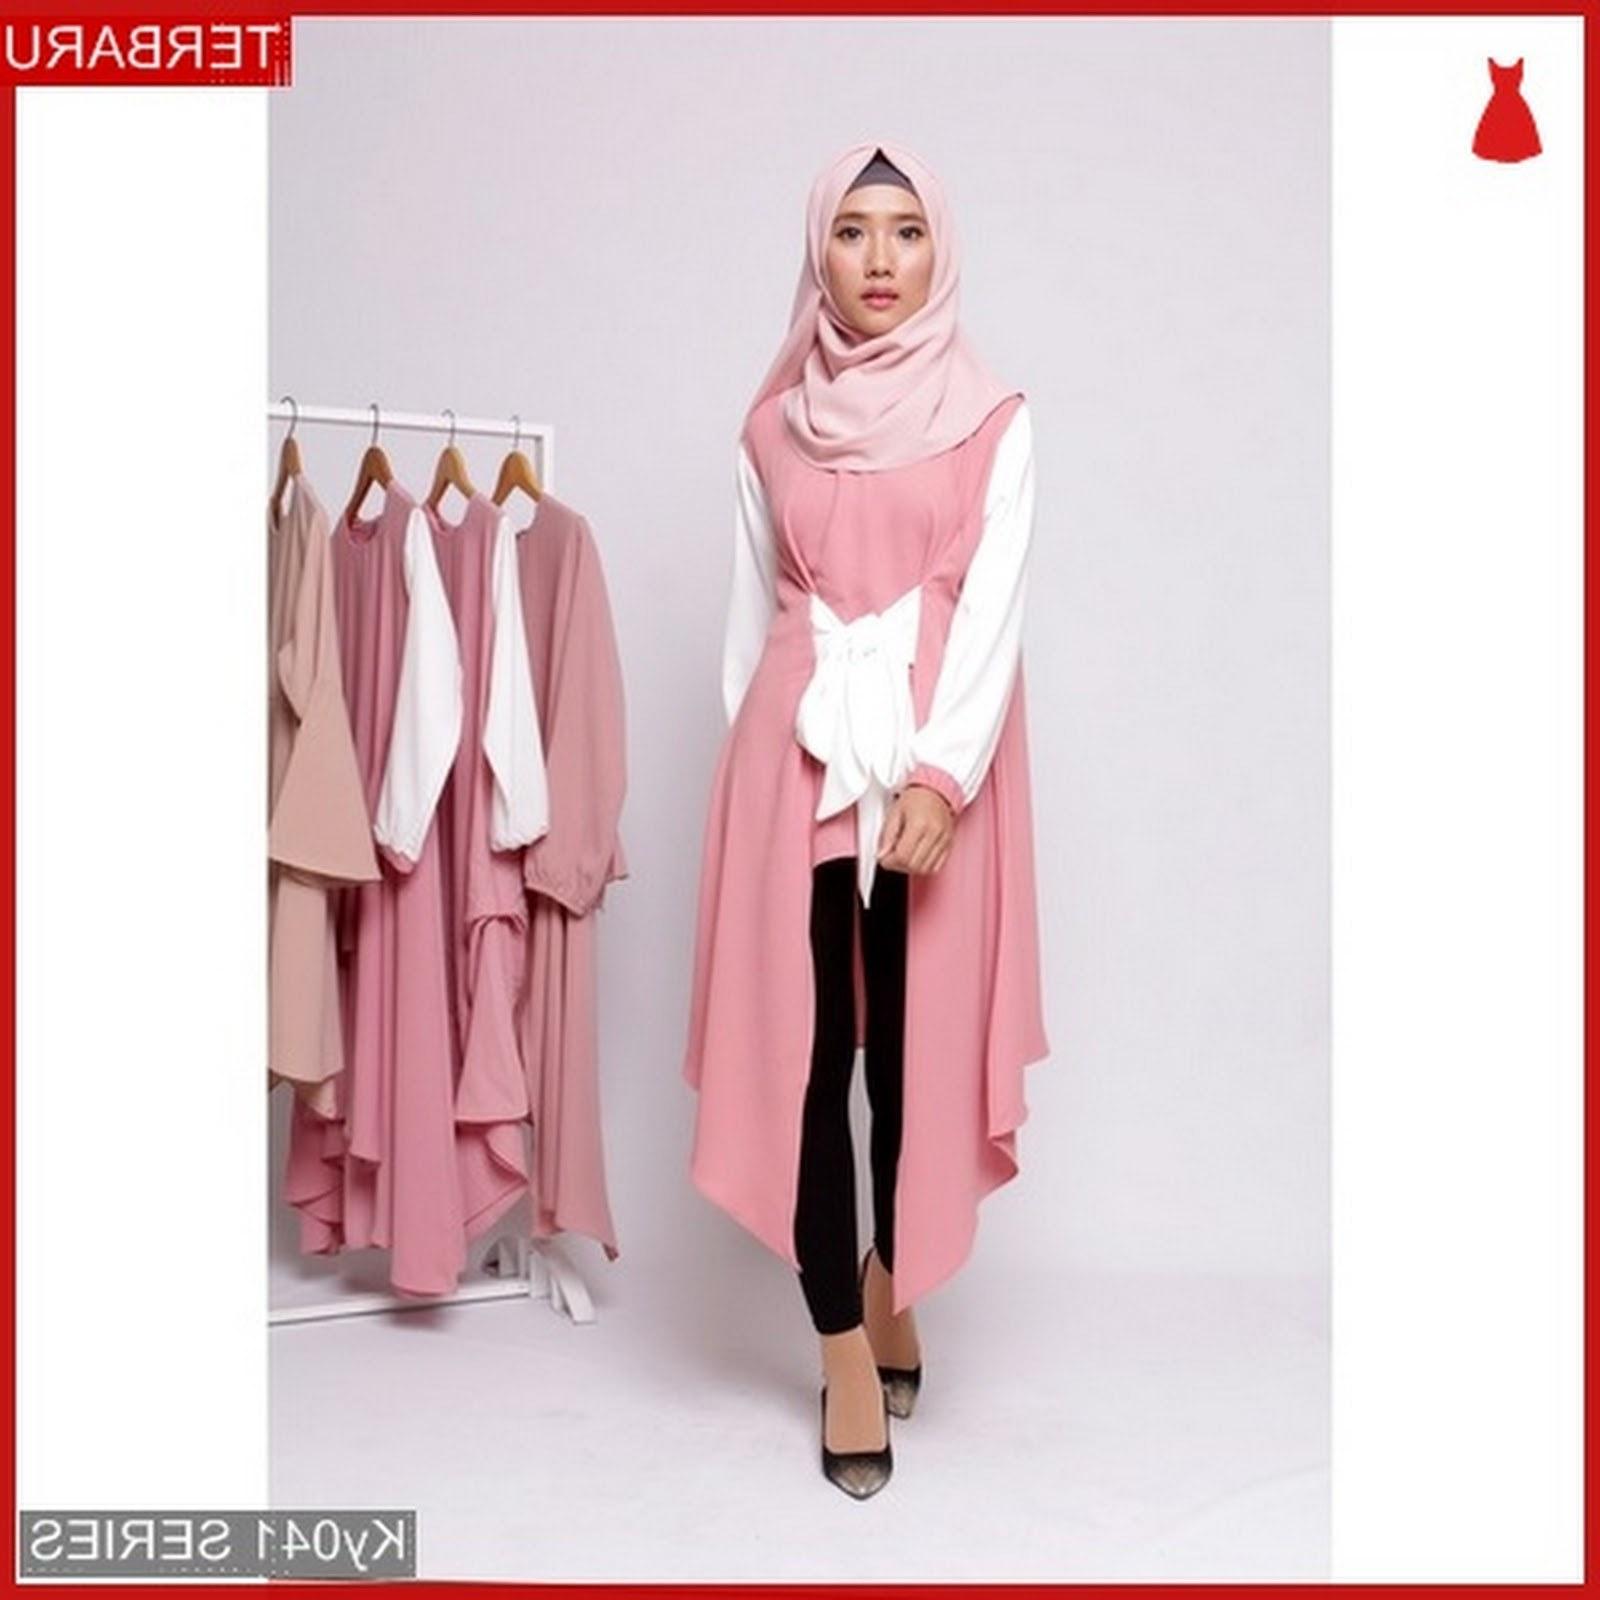 Bentuk Harga Baju Lebaran D0dg Dapatkan Baju Muslim Lebaran Paling Keren Terbaru Di Bmg